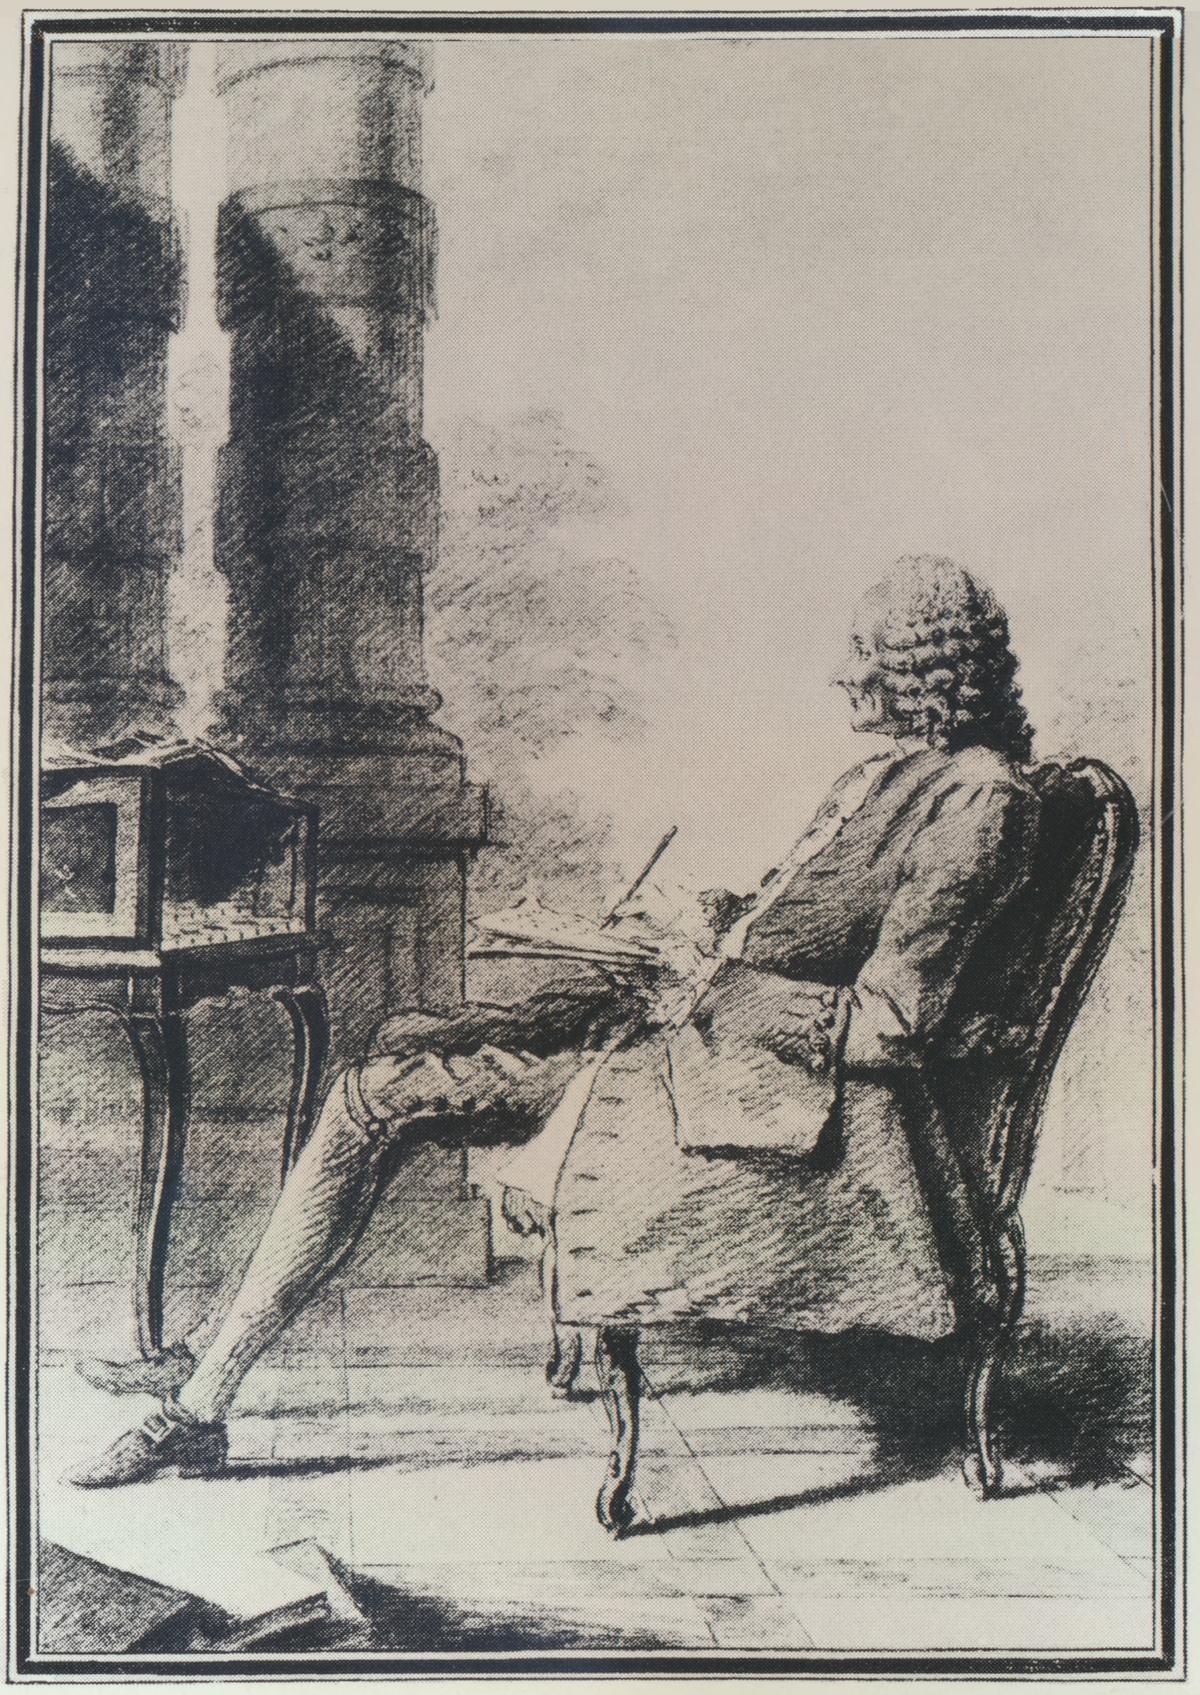 Jean-Philippe RAMEAU, un dessin de CARMONTELLE, Musée Condé, Chantilly